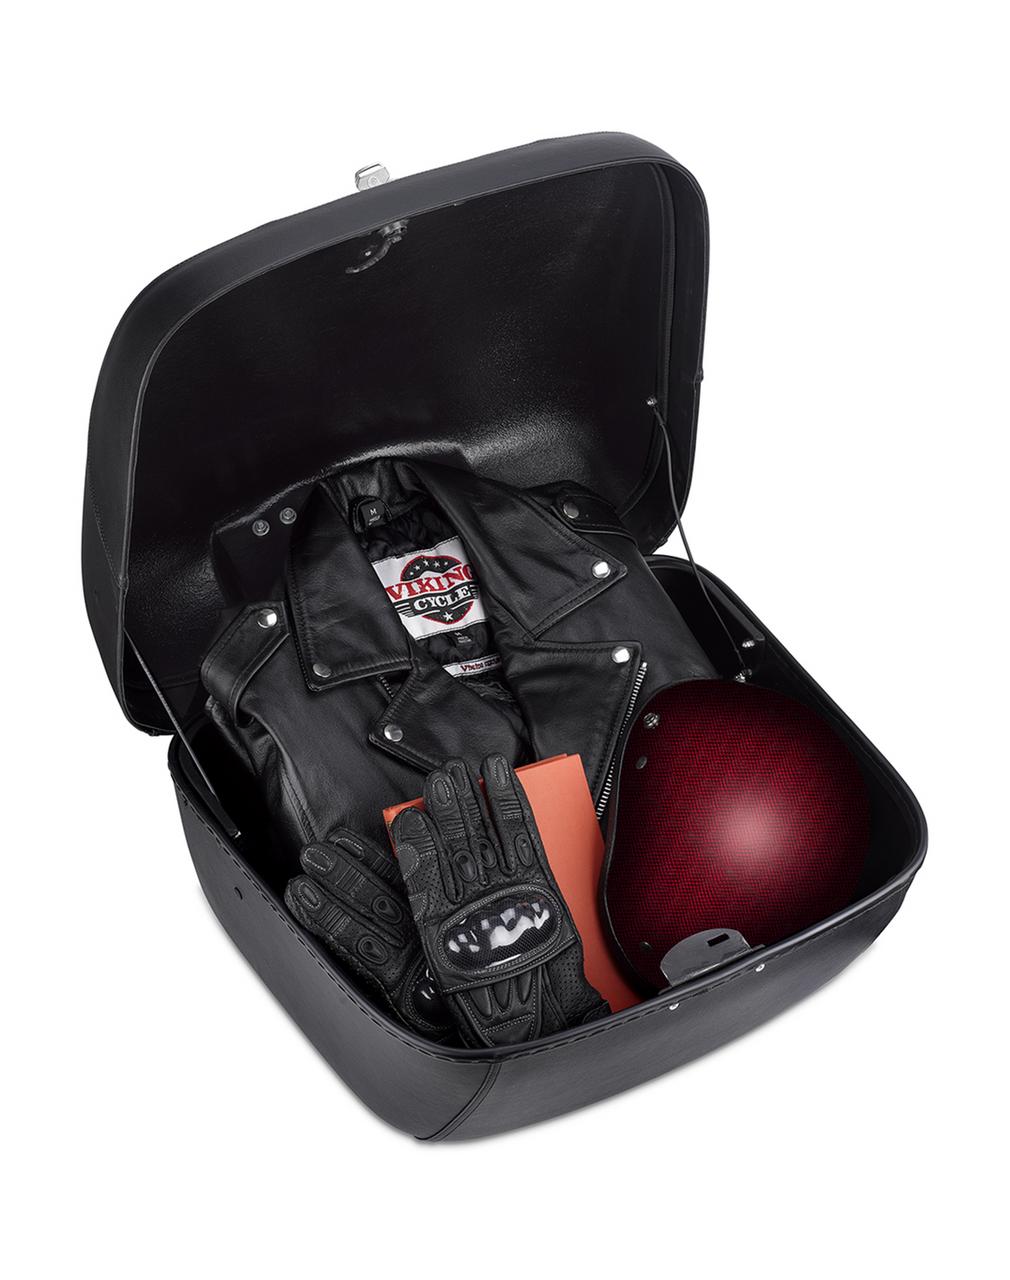 Honda Viking Premium Leather Wrapped Hard Trunk Storage View